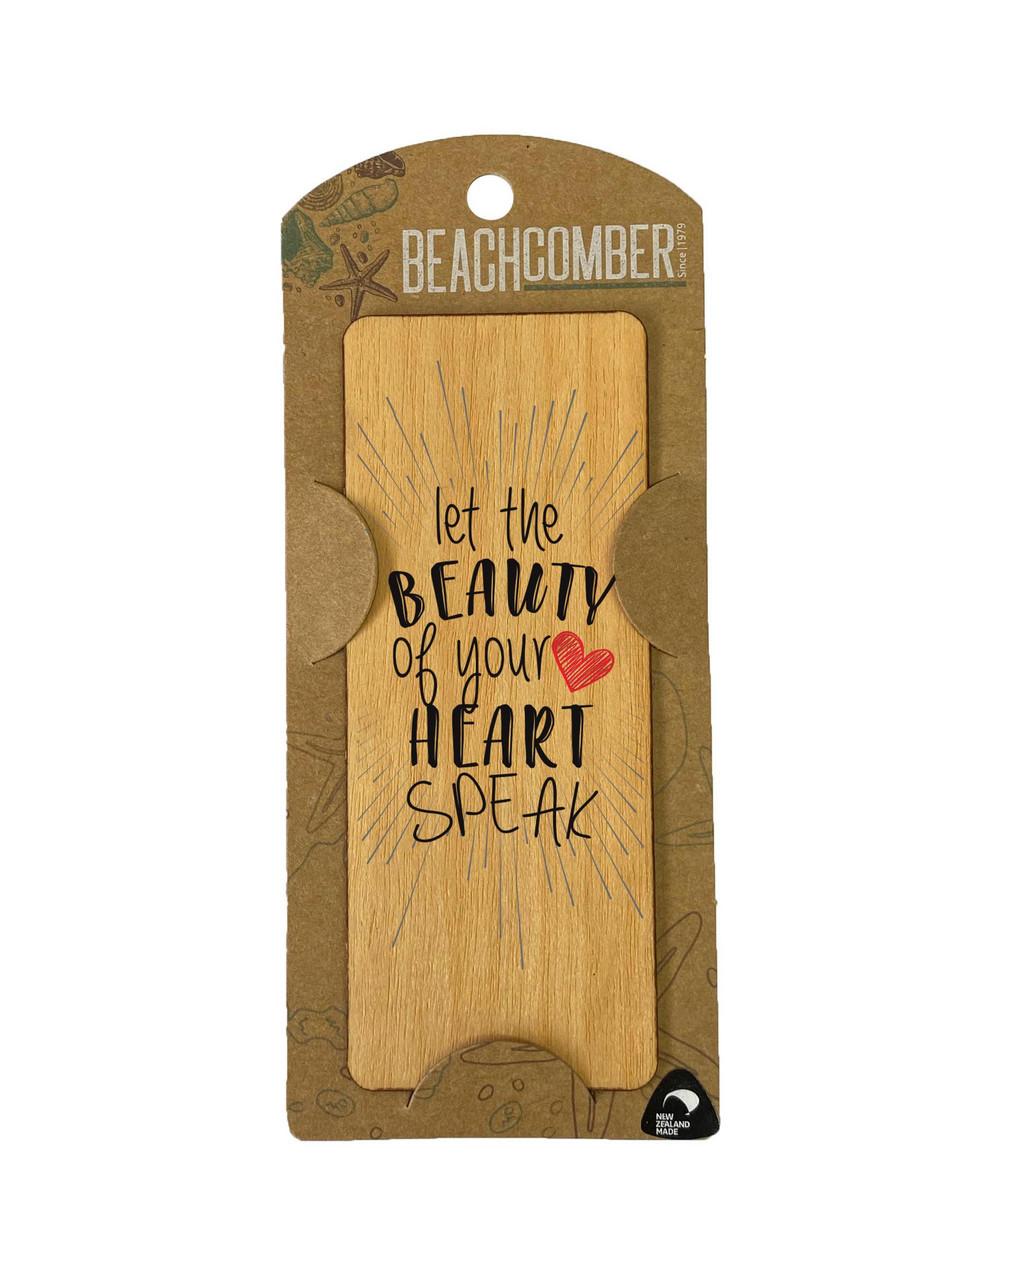 BCBM4011 Bookmark Heart speak